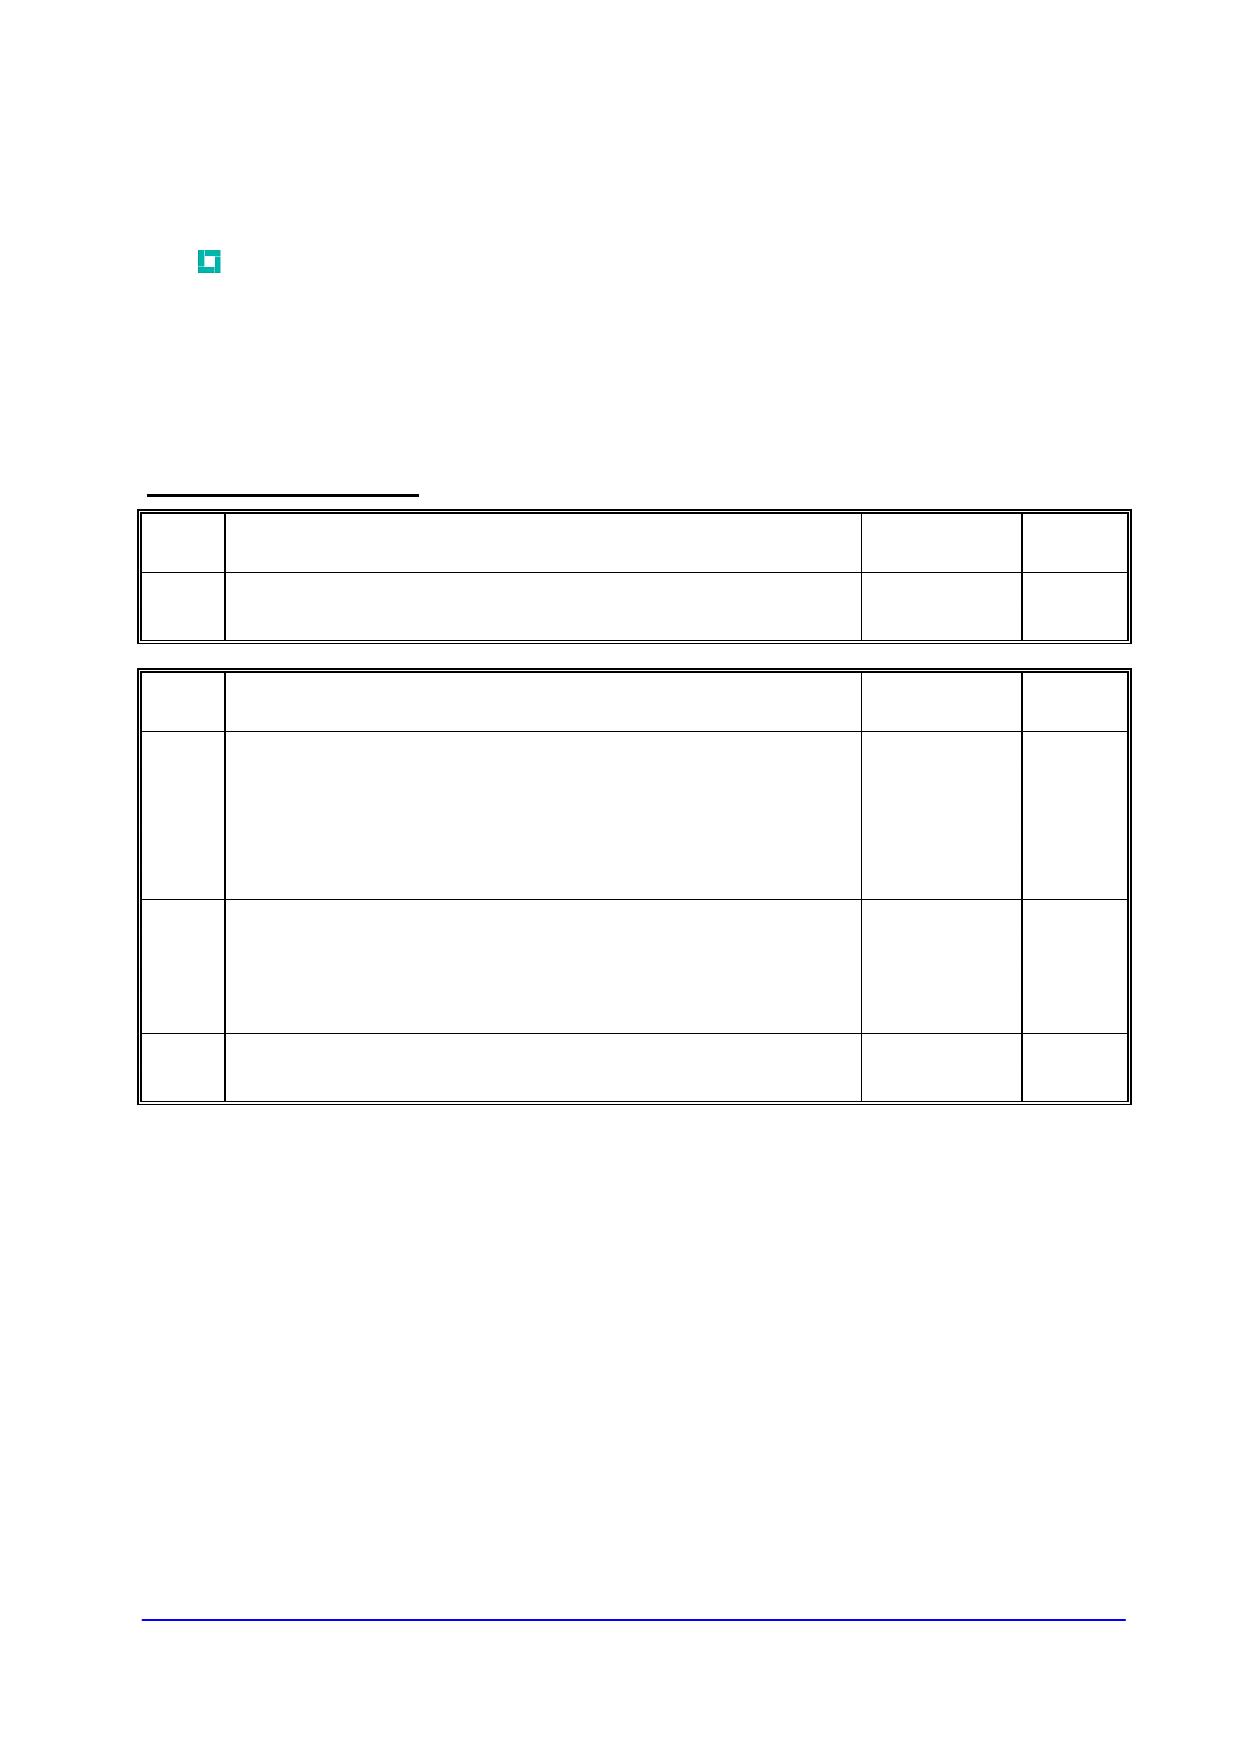 W4096ZD340 Datenblatt PDF